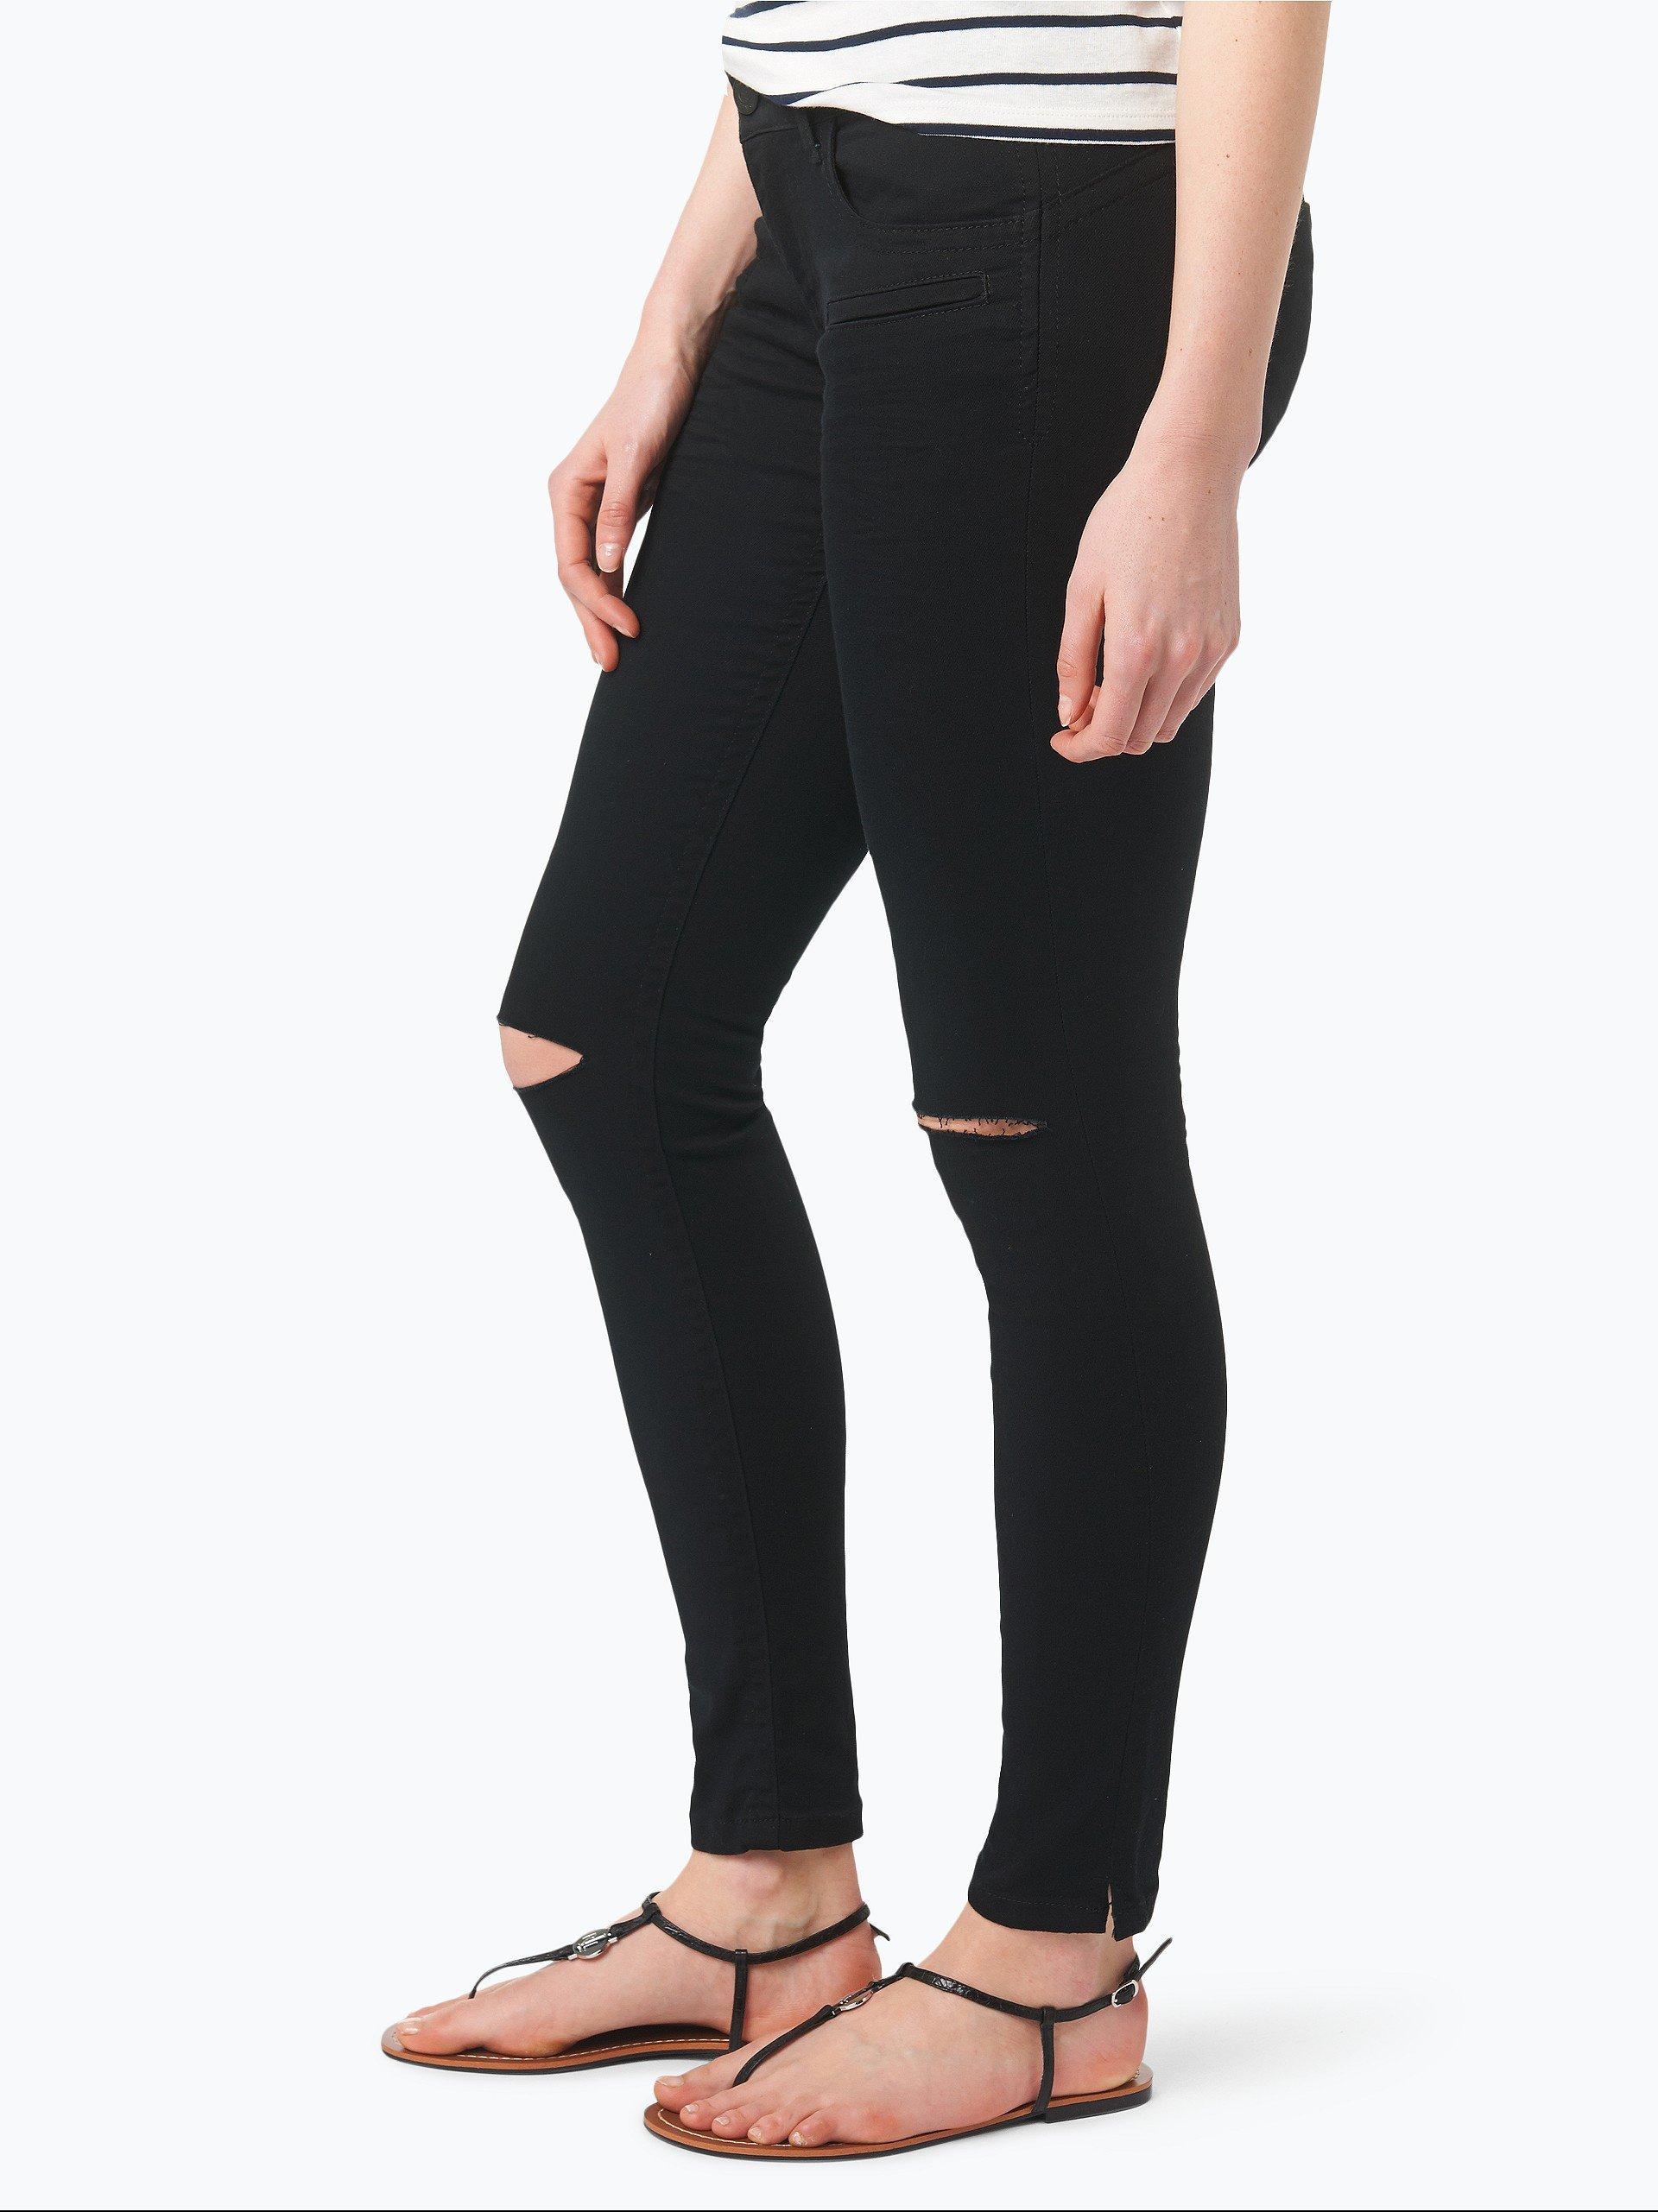 blue fire damen jeans alicia schwarz uni online kaufen. Black Bedroom Furniture Sets. Home Design Ideas